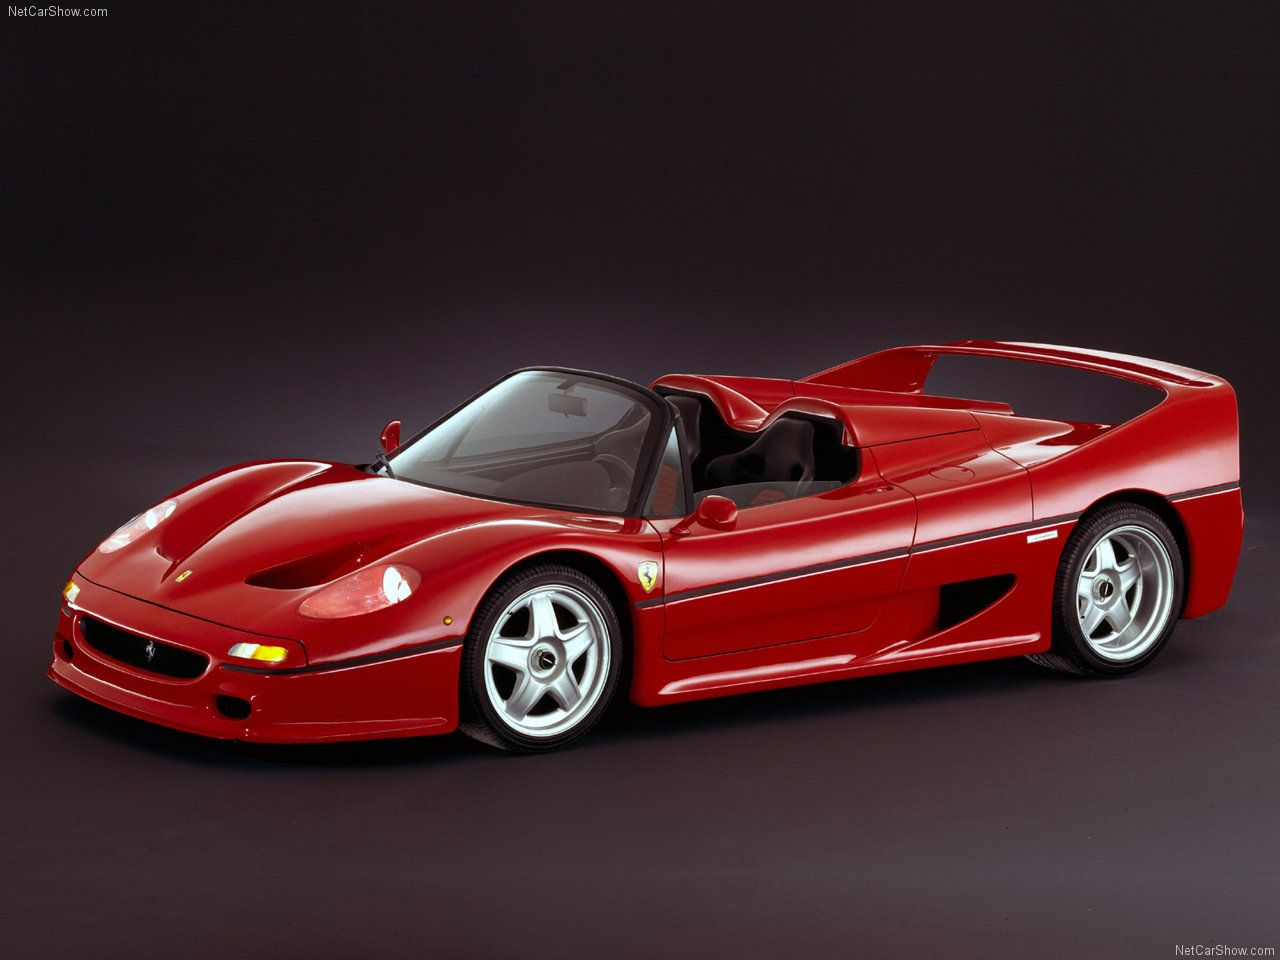 Ferrari F50 Wallpapers Top Free Ferrari F50 Backgrounds Wallpaperaccess